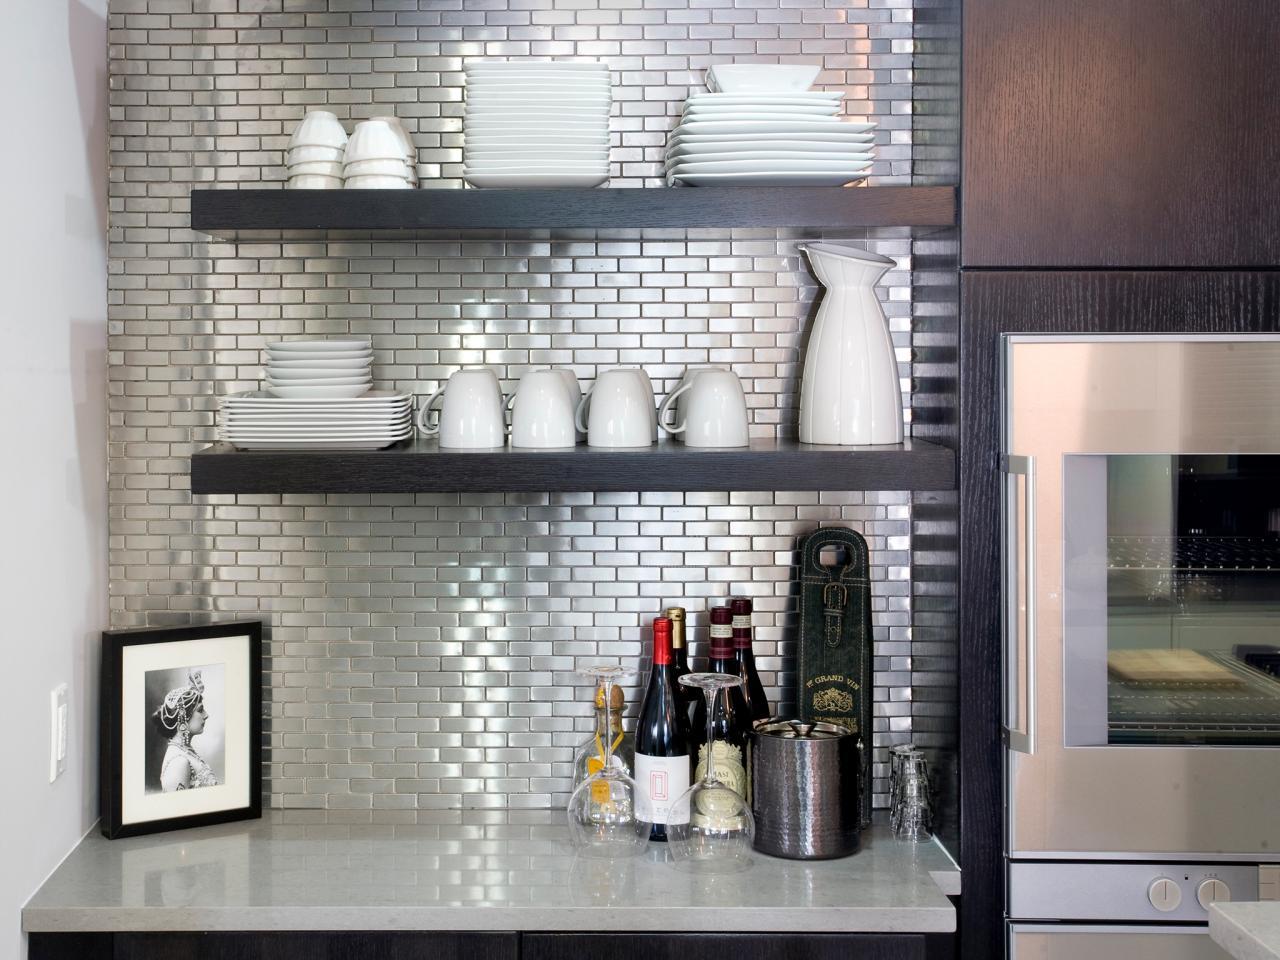 Unusual, mirrored kitchen rear wall